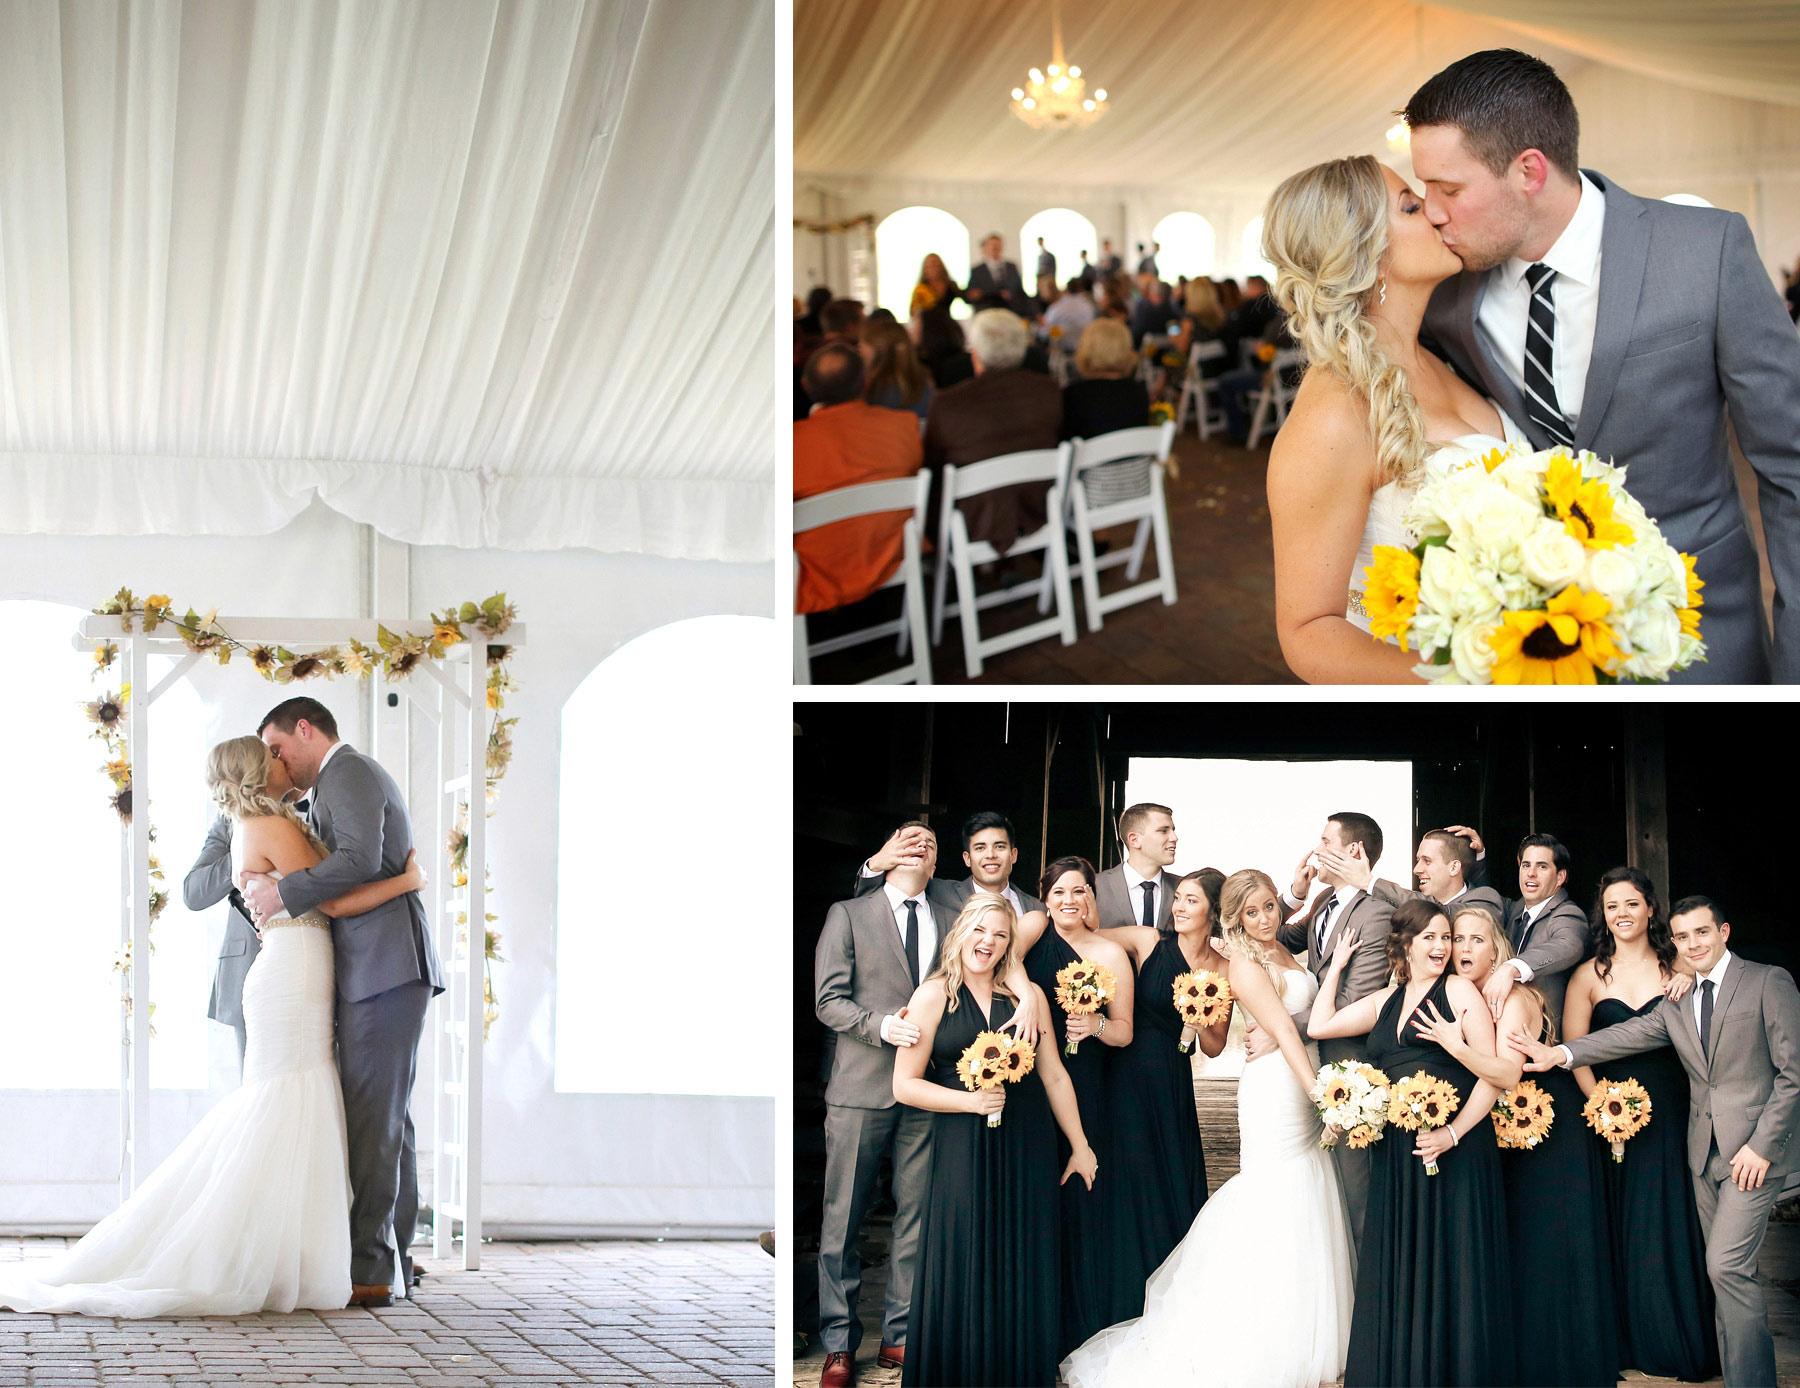 18-Stillwater-Minnesota-Wedding-Photographer-by-Andrew-Vick-Photography-Fall-Autumn-StoneRidge-Golf-Club-Ceremony-Bride-Groom-Kiss-Recessional-Flowers-Sunflowers-Roses-Bridal-Party-Bridesmaids-Groomsmen-Barn-Vintage-Micaela-and-Derek.jpg